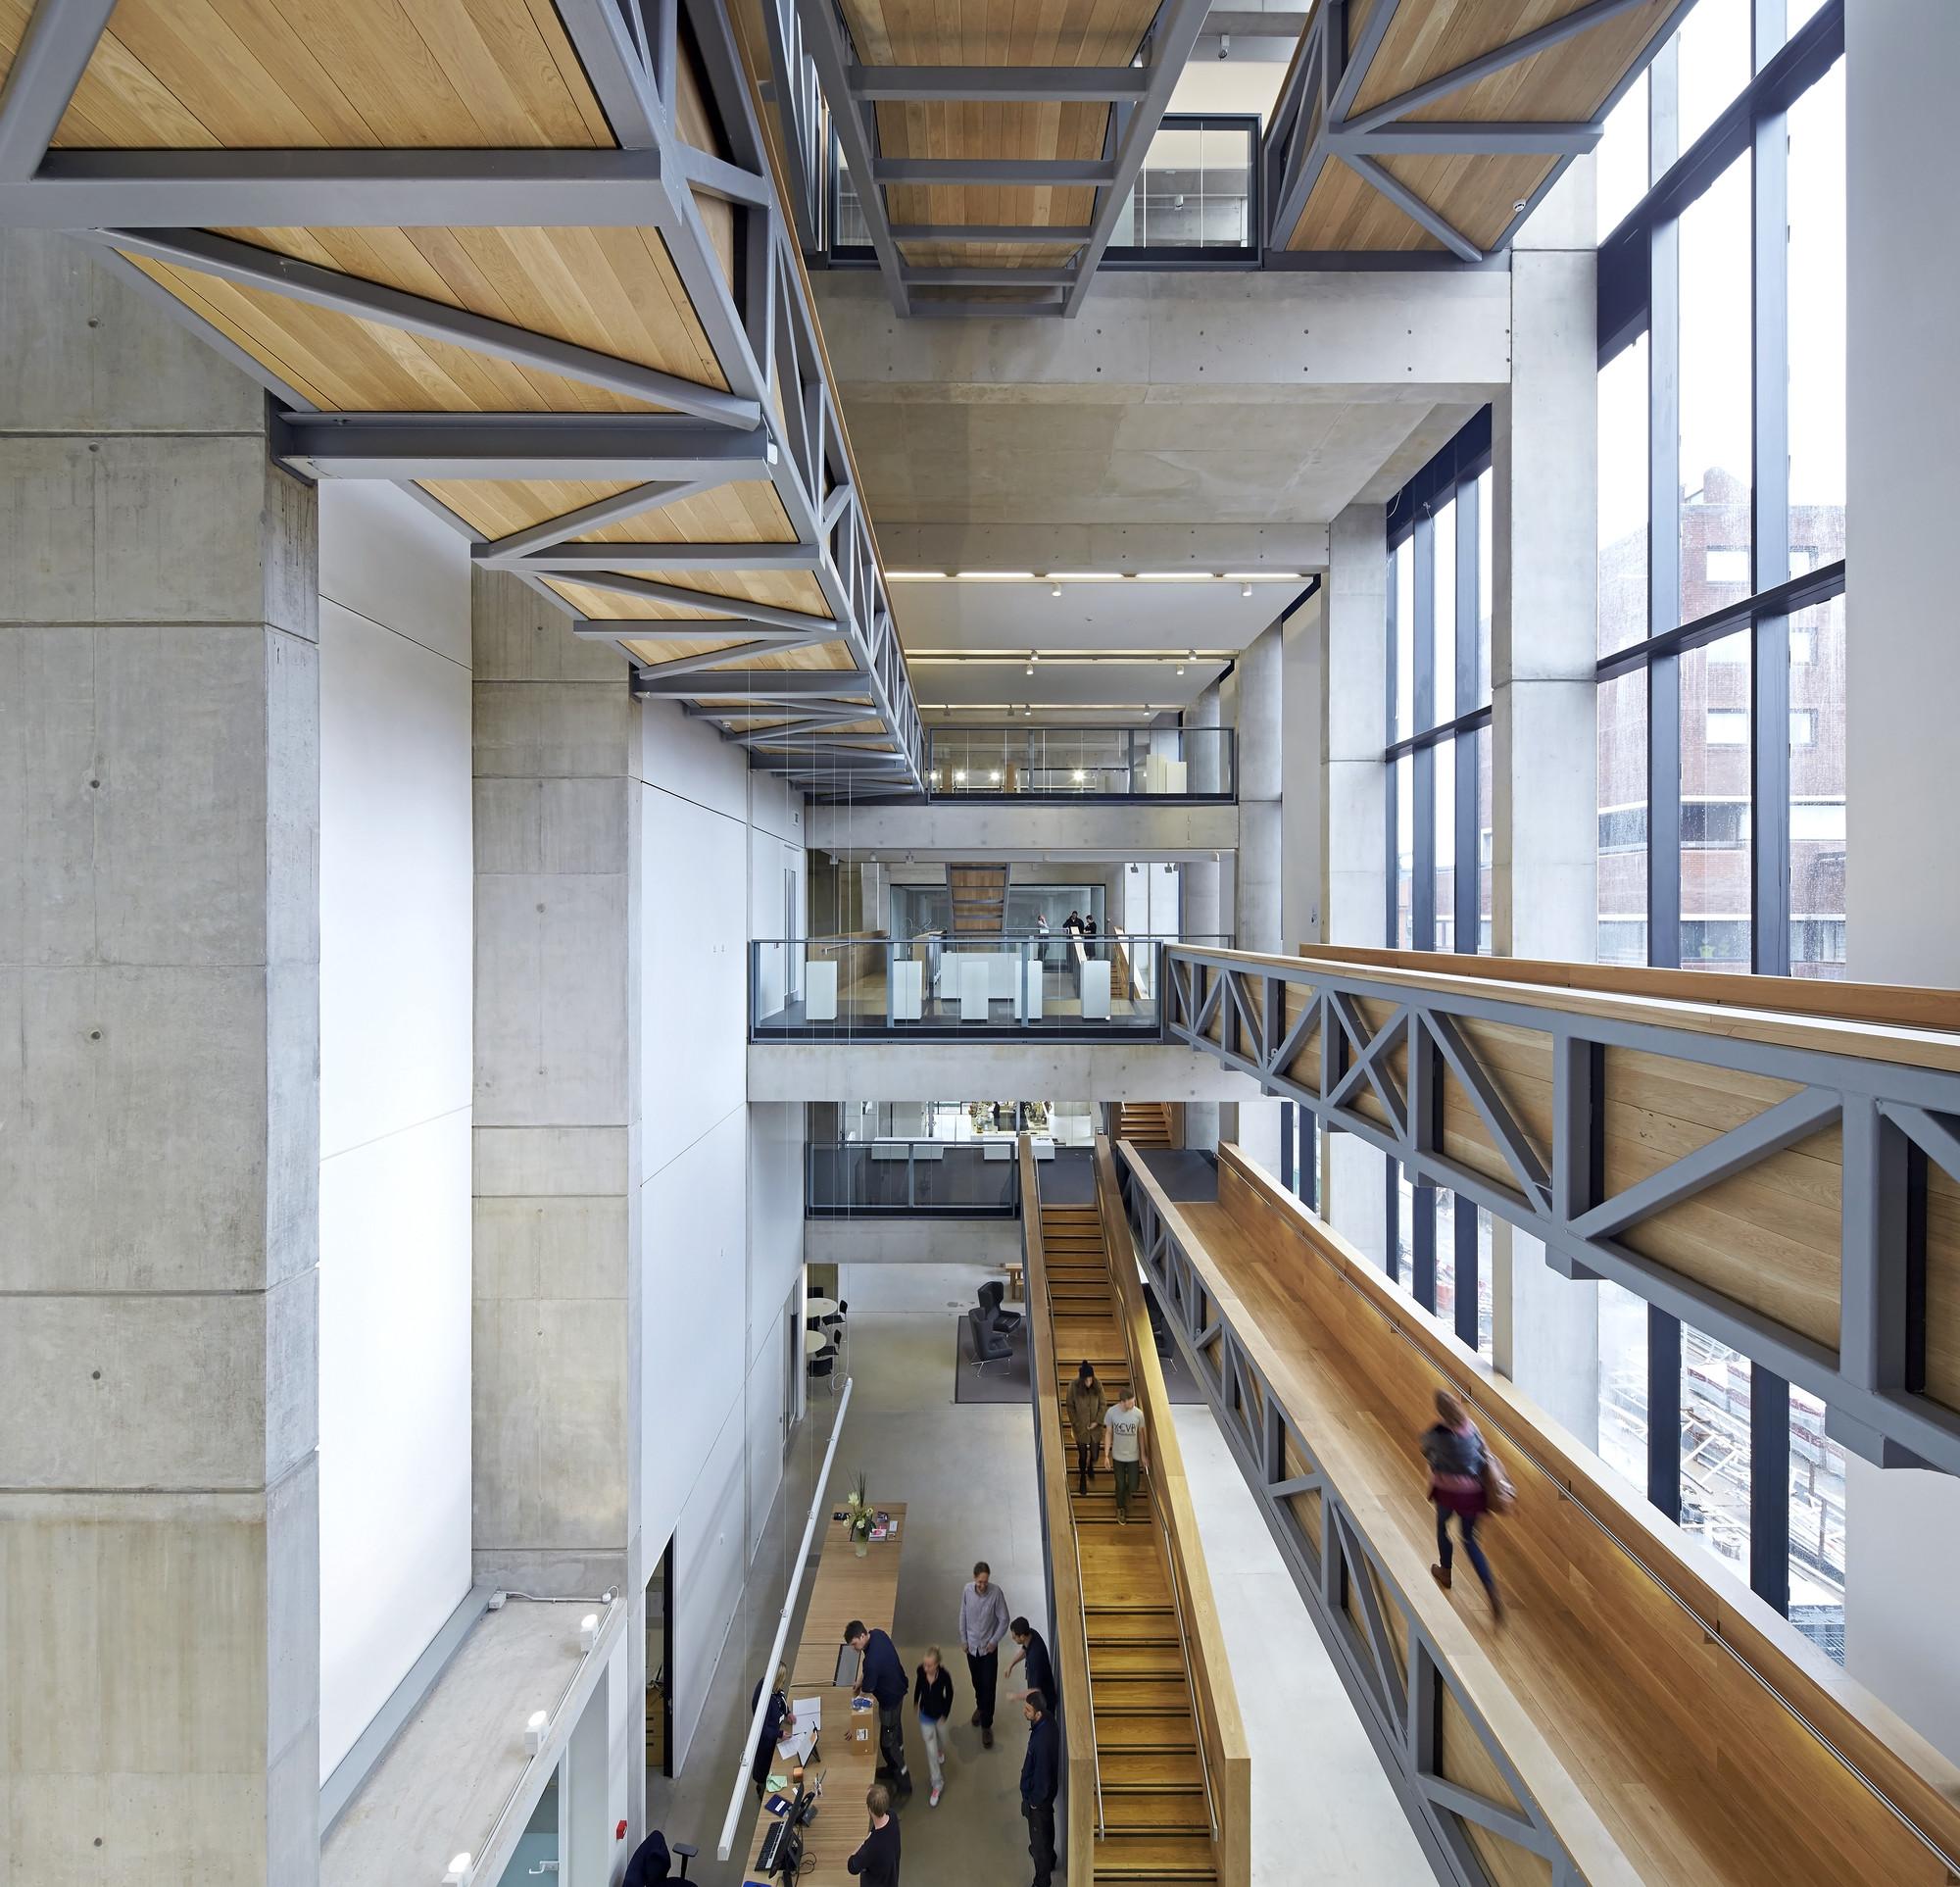 Manchester School of Art / Feilden Clegg Bradley Studios, © Hufton + Crow